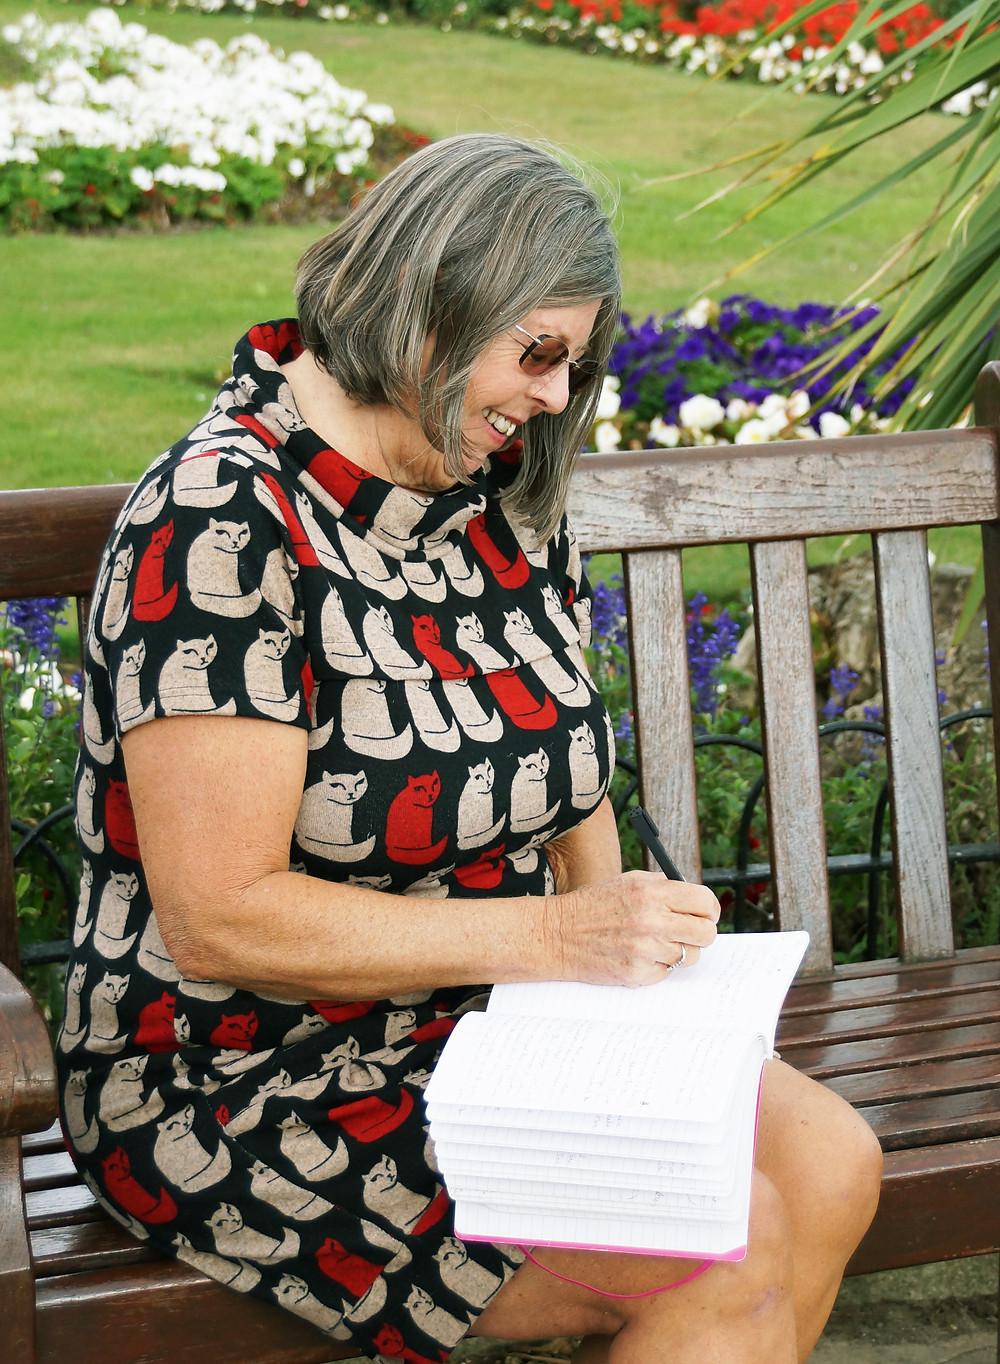 Author Wendy Turbin hones a manuscript